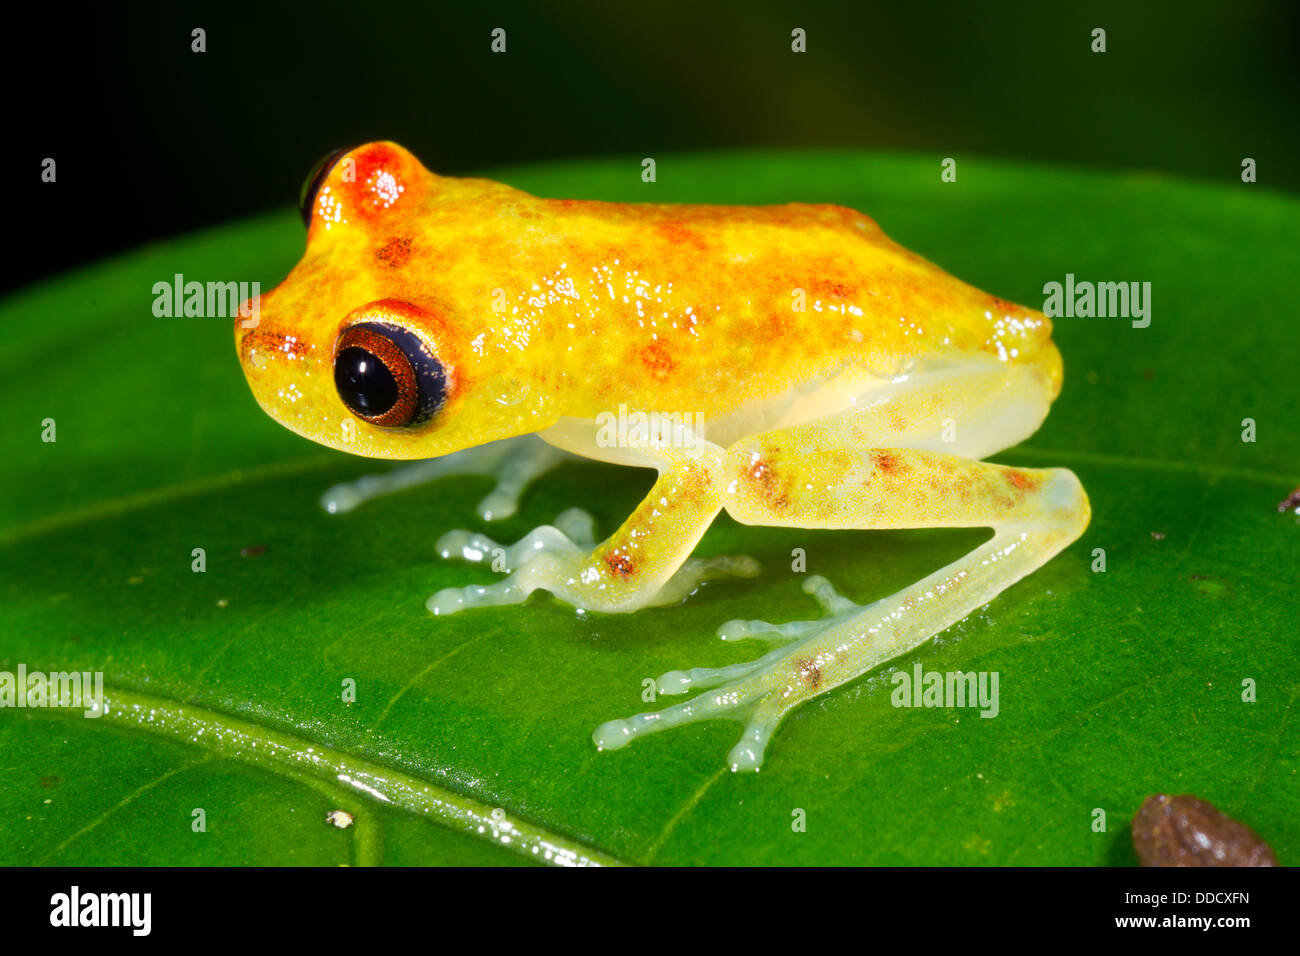 Juvenile Nymph Treefrog (Hypsiboas nympha) on a rainforest leaf, Ecuador Stock Photo